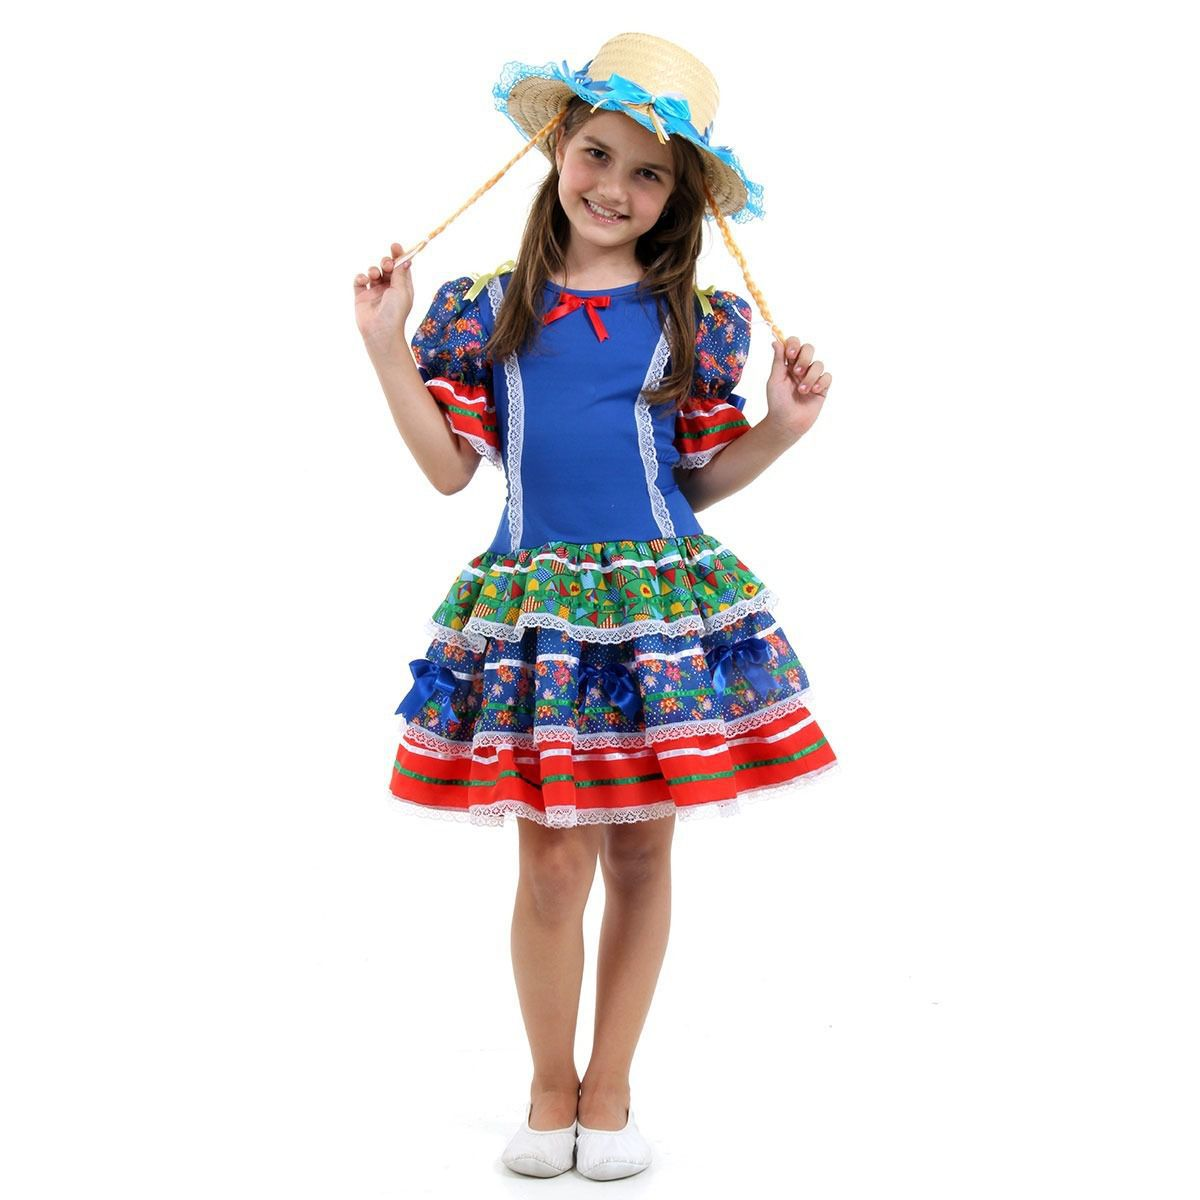 Fantasia Vestido Festa Junina Caipirinha Infantil C/ Chapéu